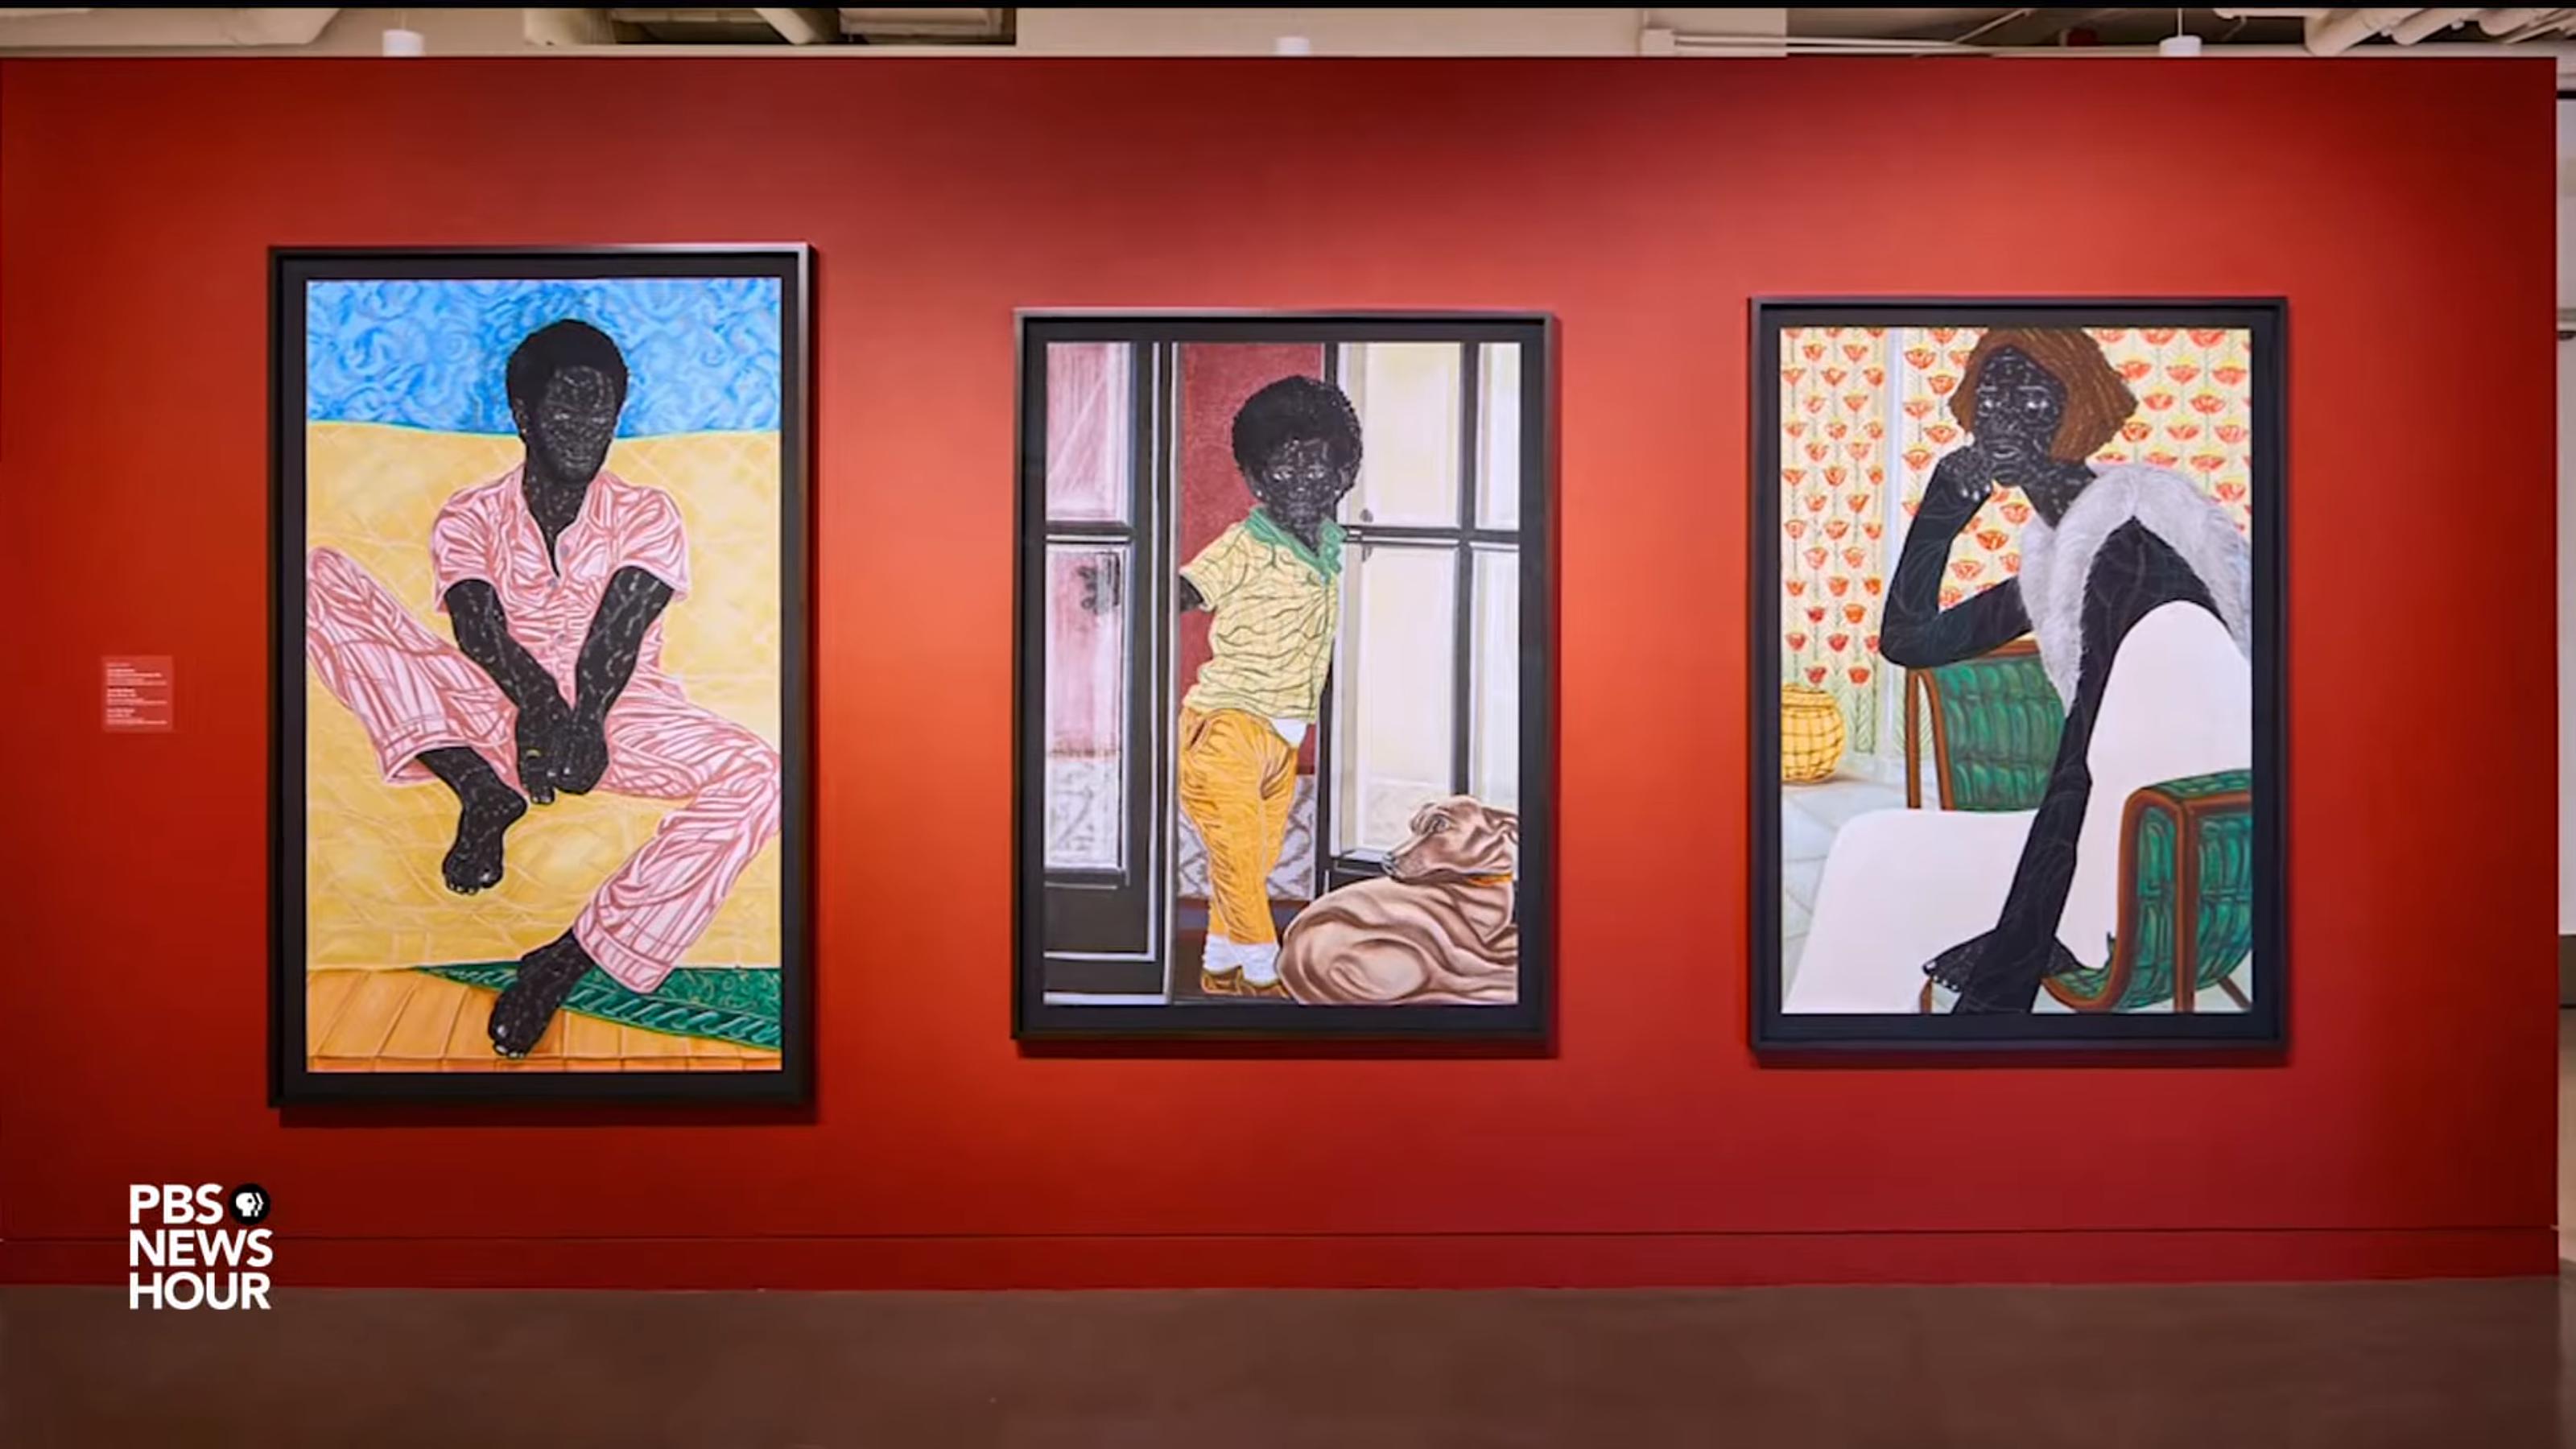 three paintings by Toyin Ojih Odutola